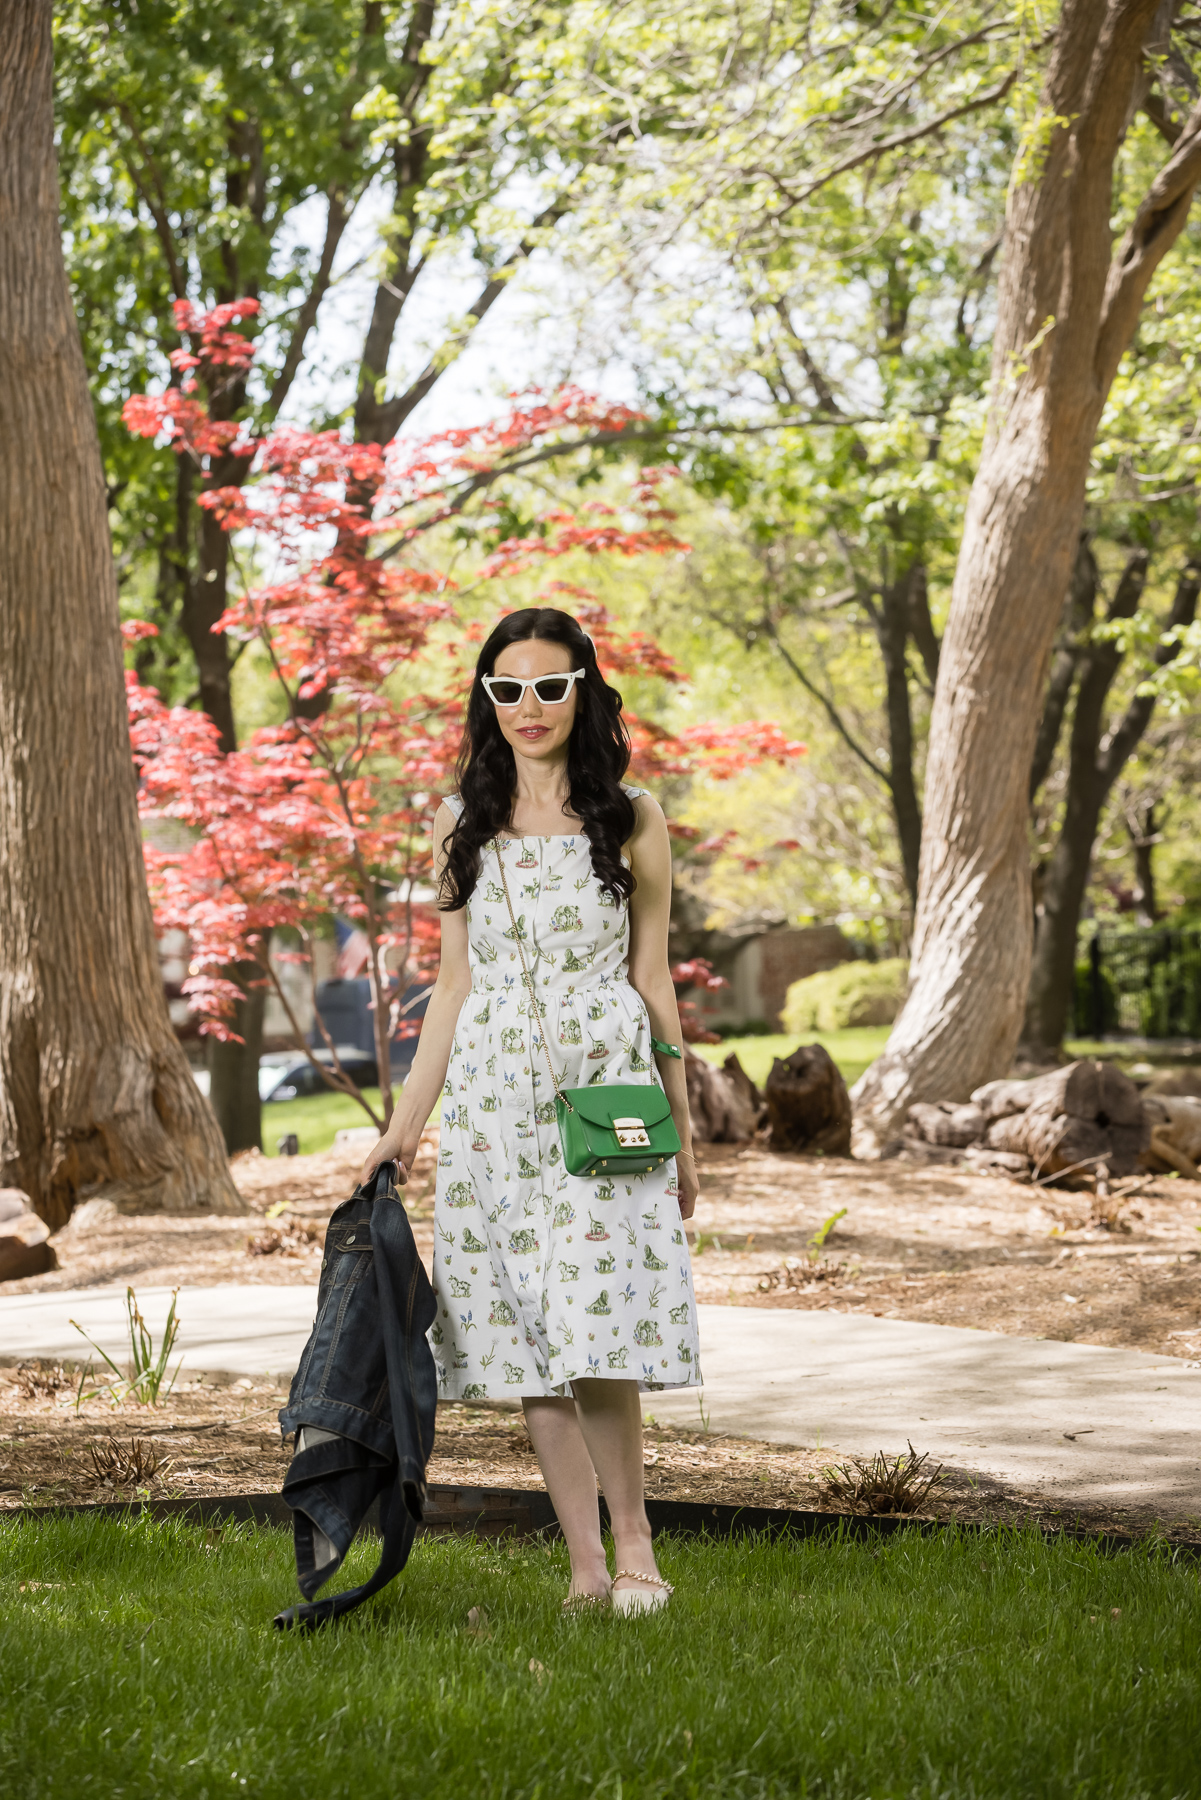 Sarah Patrick Collection Newport Topiary Gardens Dress, Furla Crossbody Bag, Italic Cat eye Sunglasses